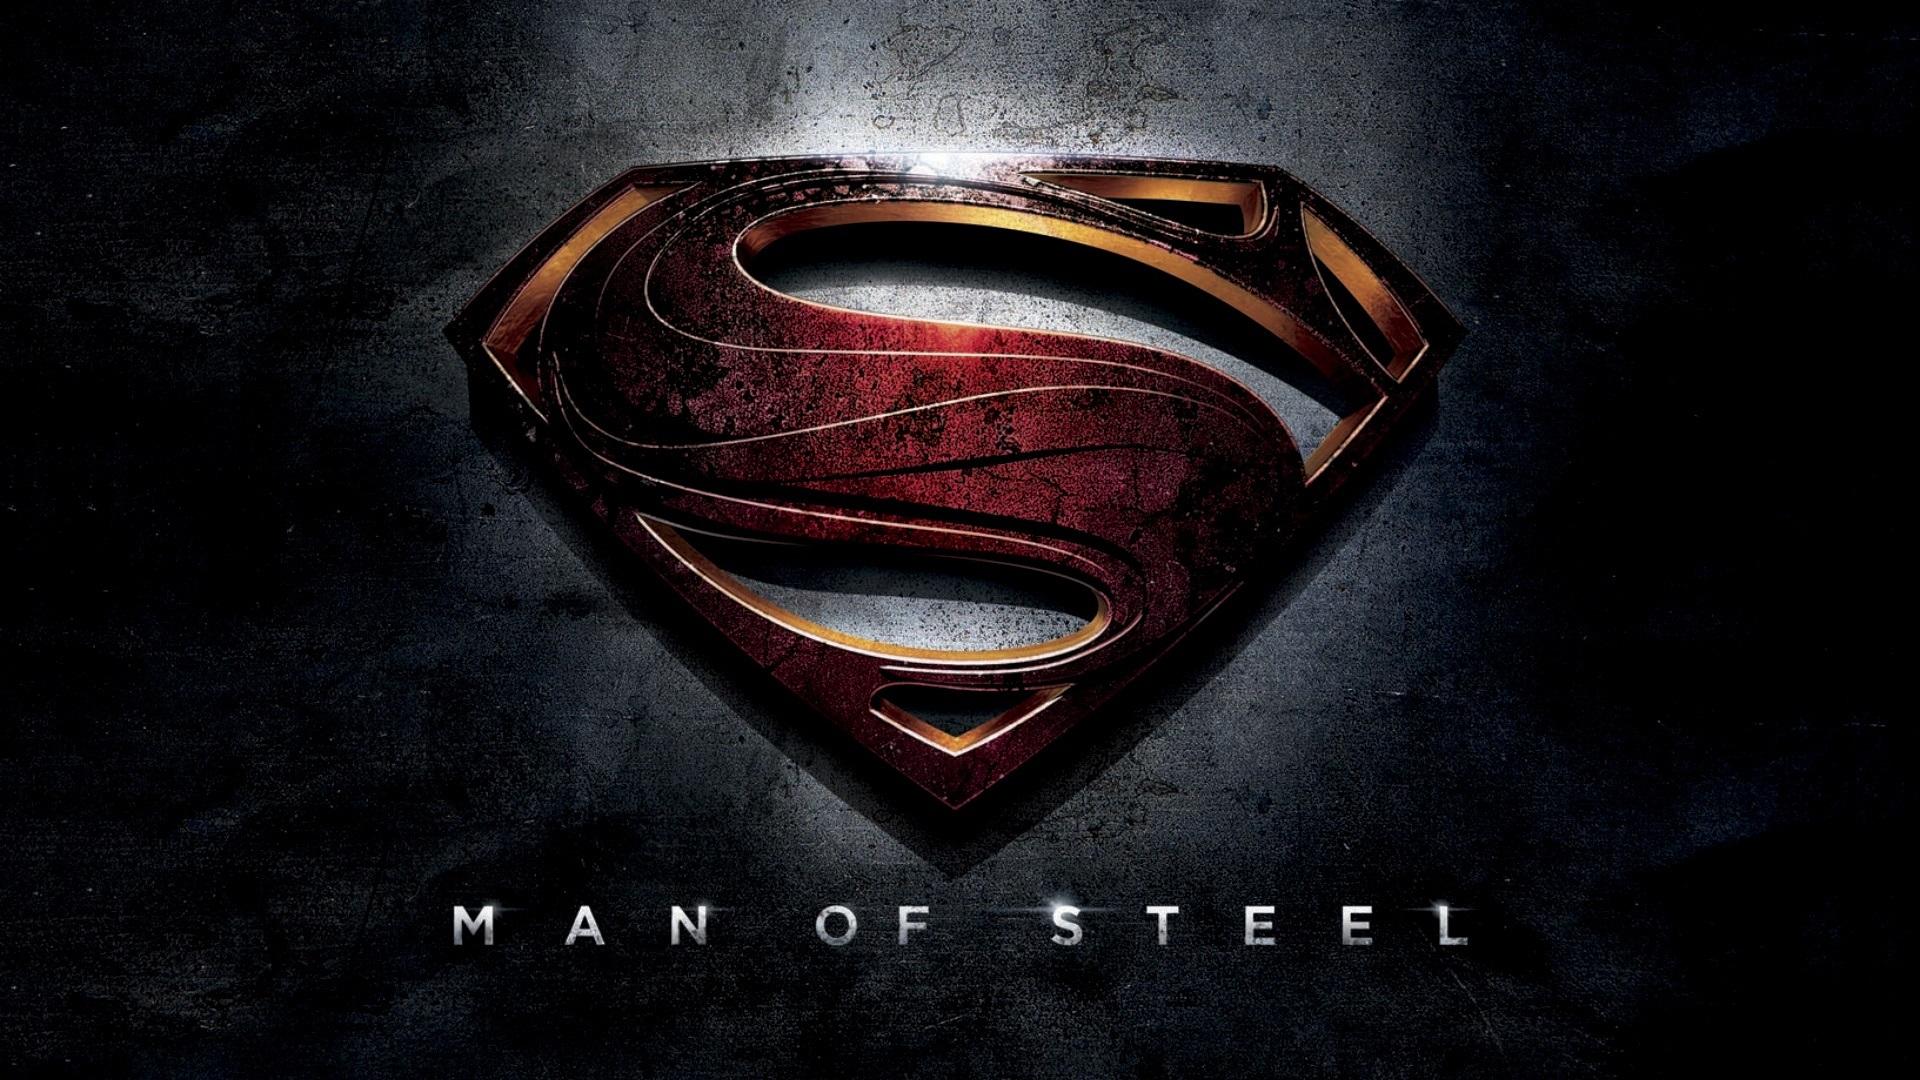 Man Of Steel Wallpapers & photos